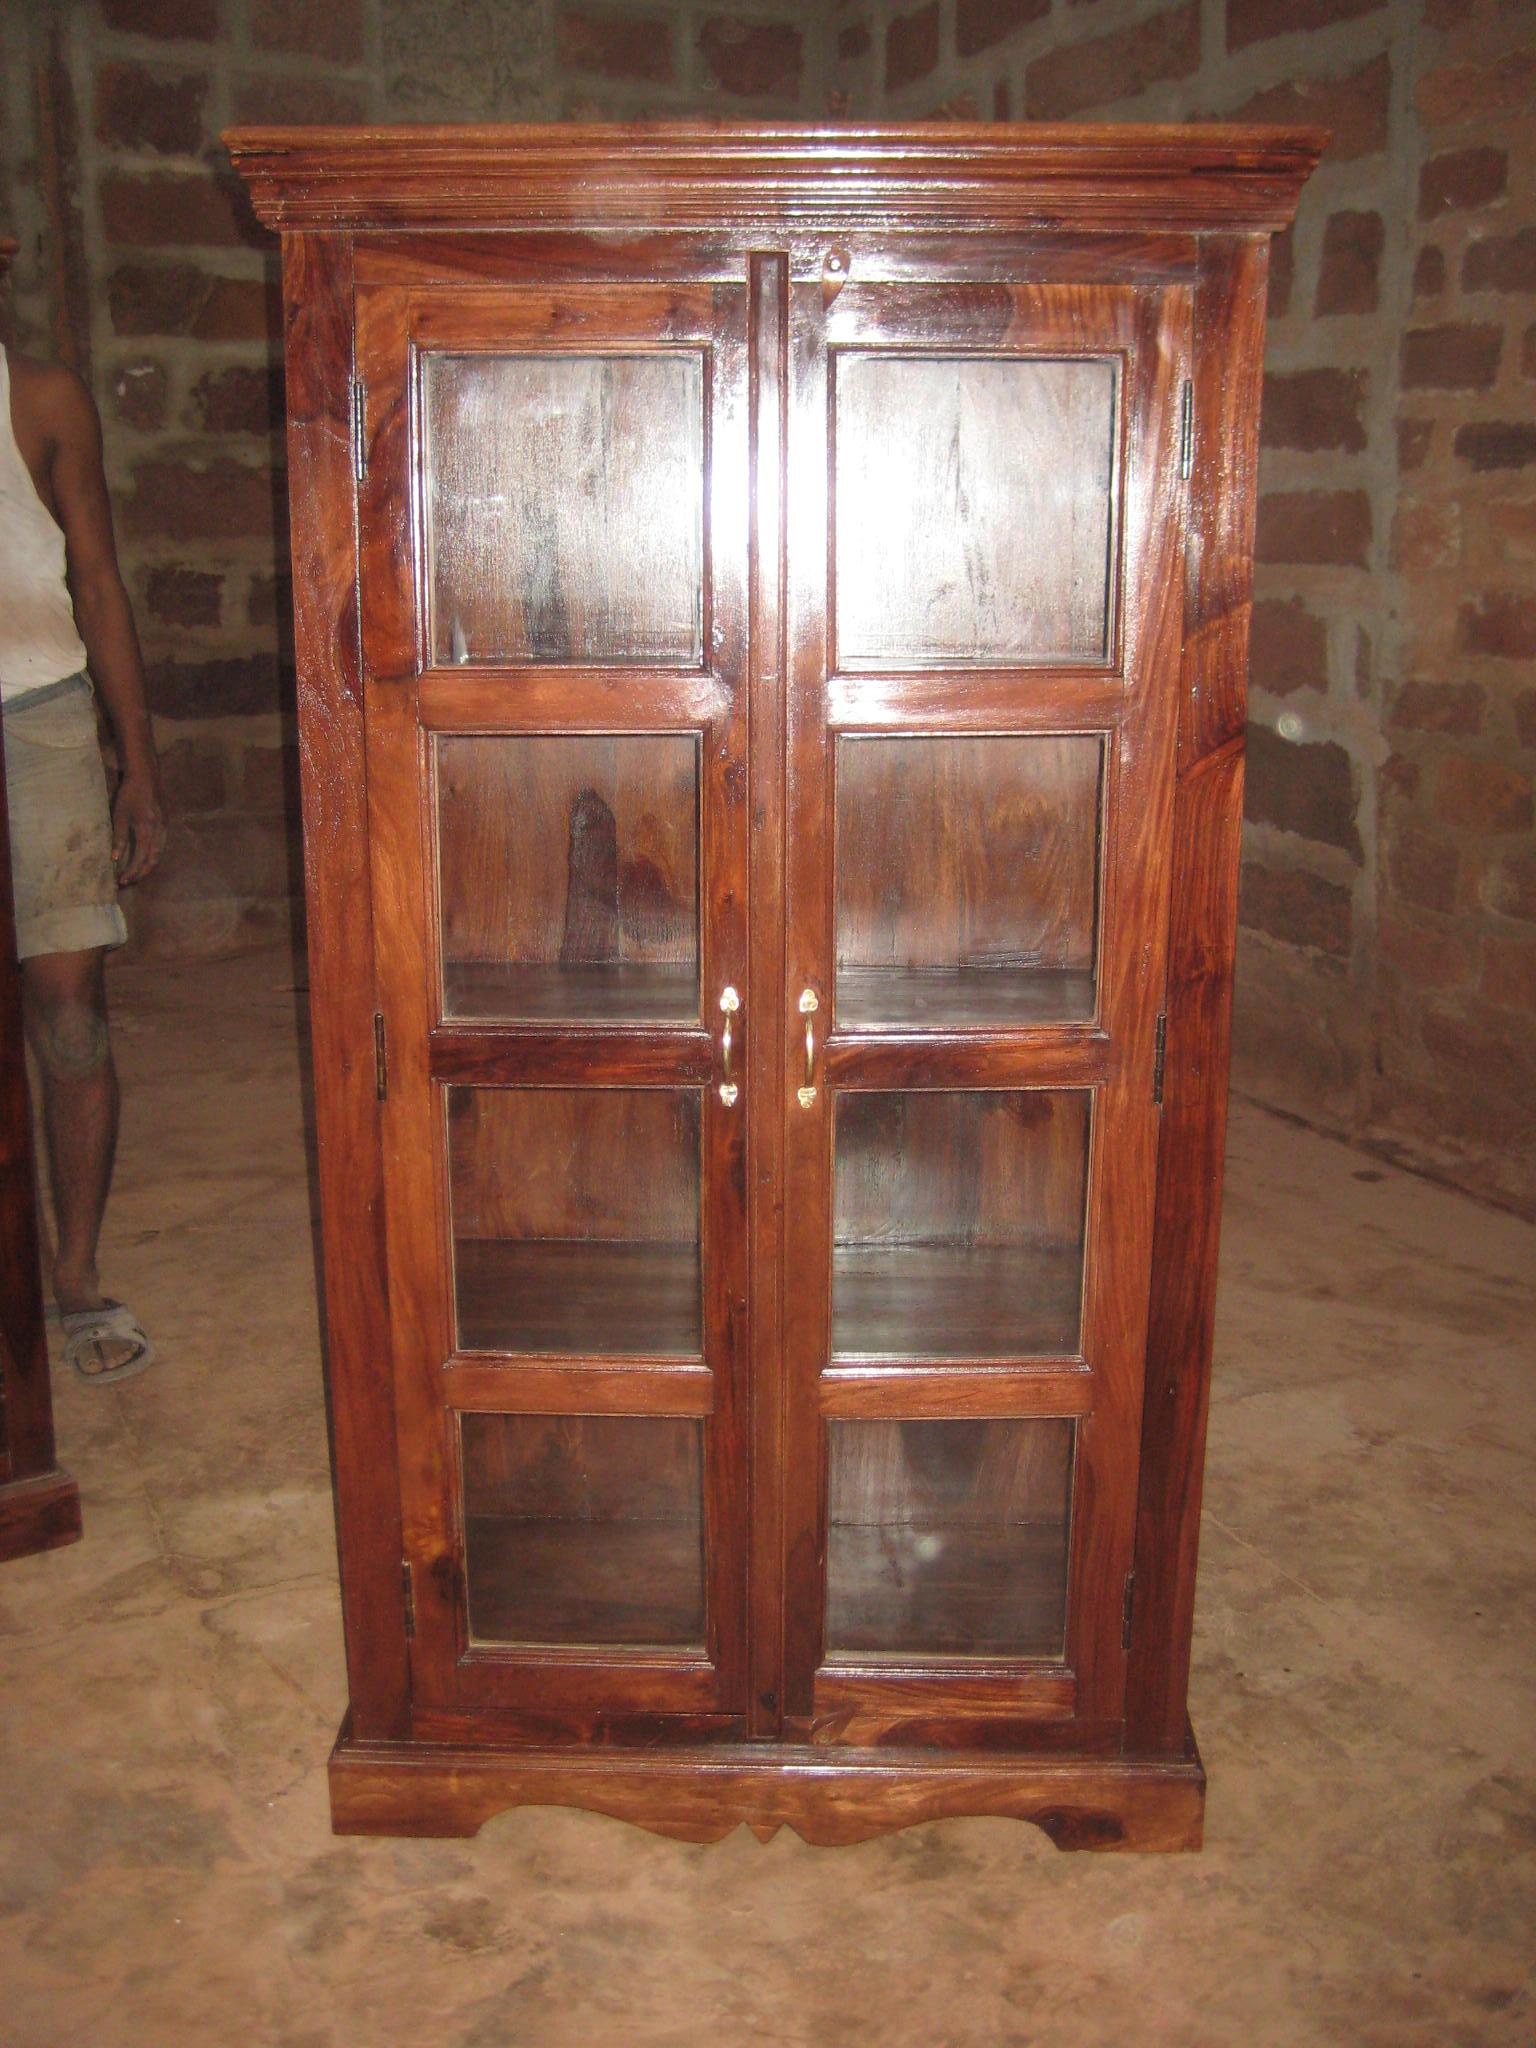 Sheesham Bedroom Furniture Indian Wooden Wardrobe Bedroom Wardrobe Bedroom Furniture